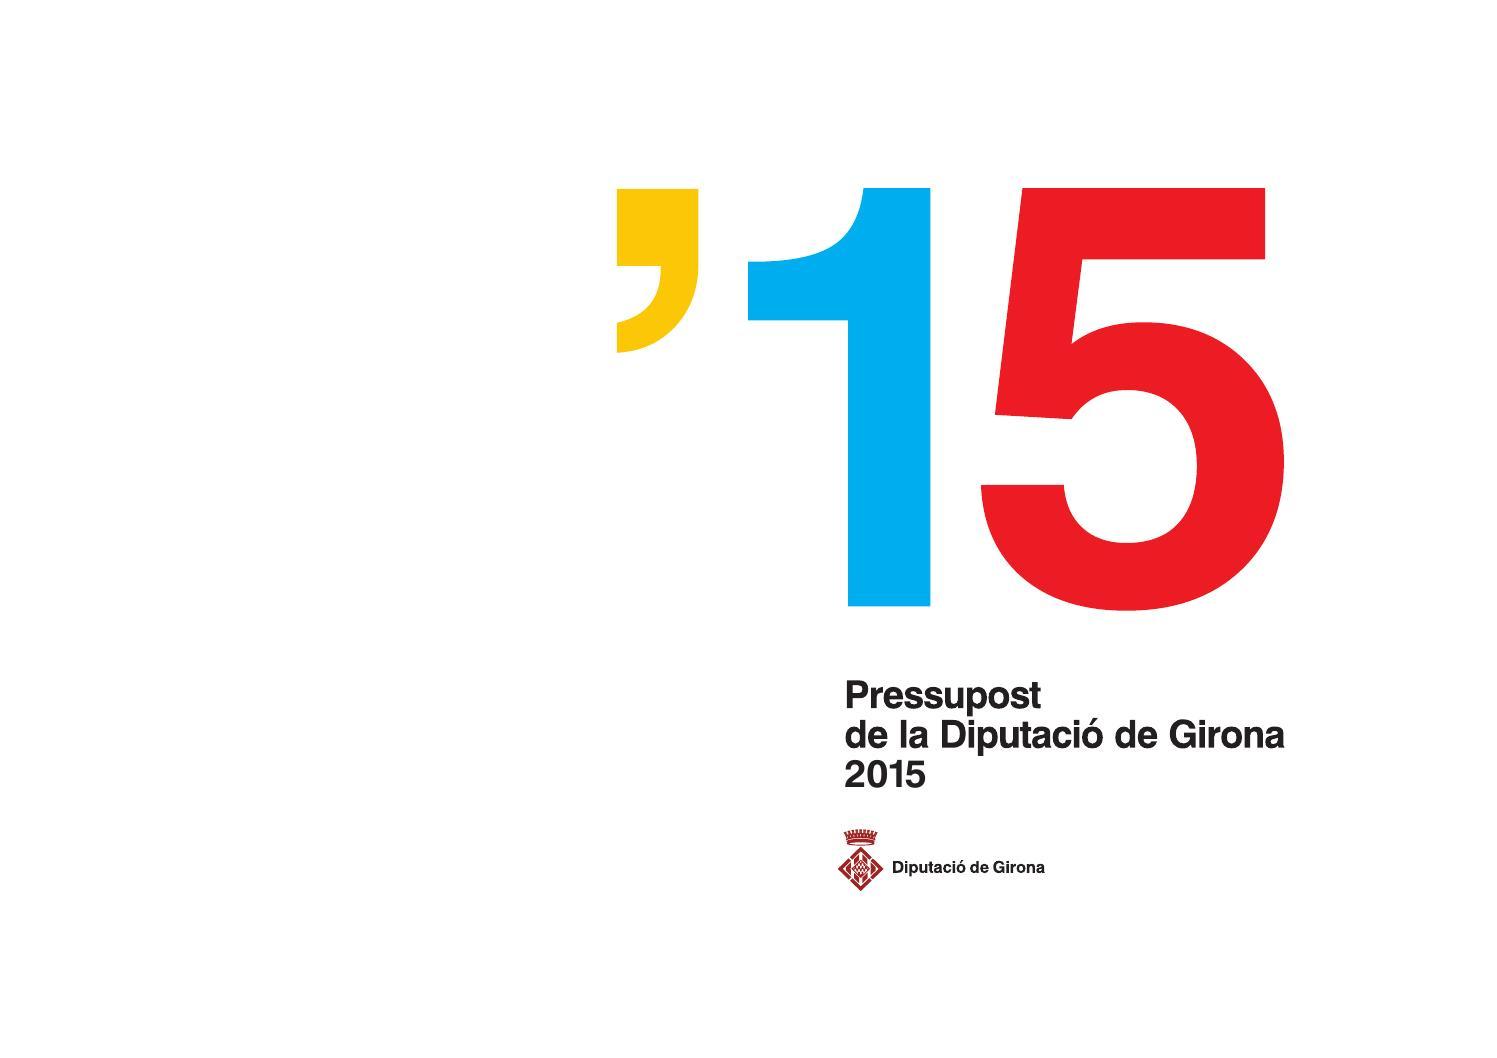 Diputaci de girona pressupost 2015 by diputaci de for Oficina habitatge girona